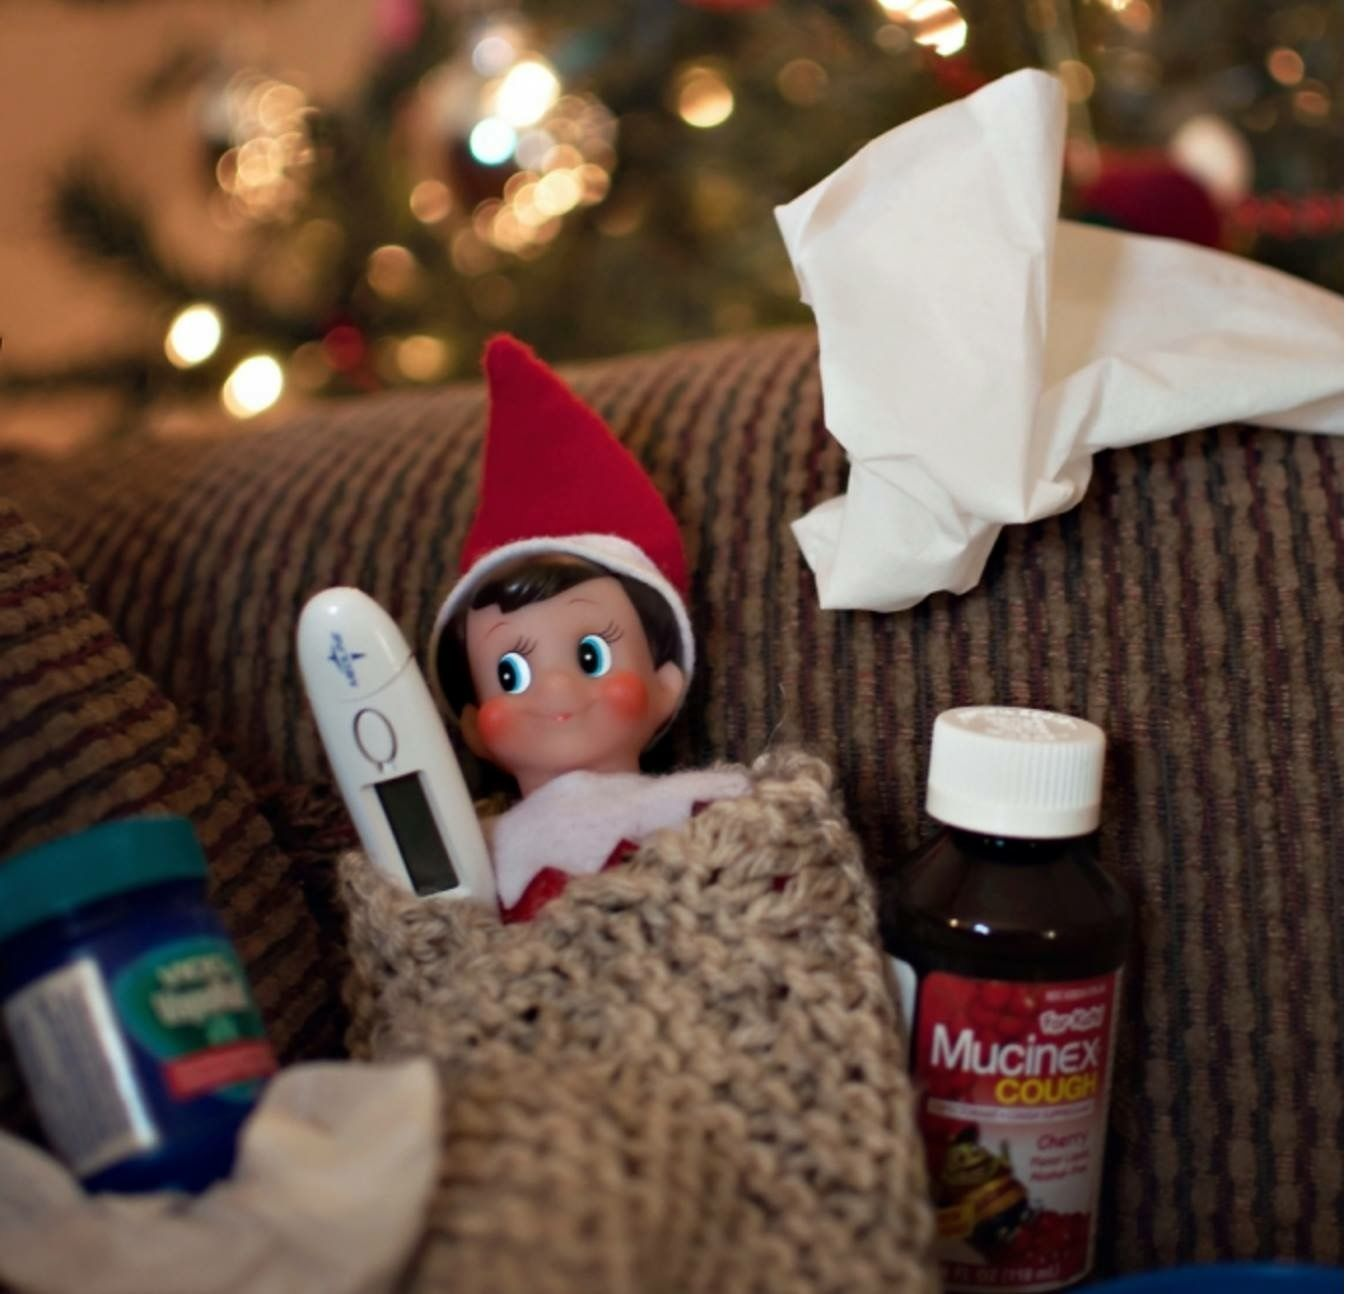 Pin on Elf on the shelf